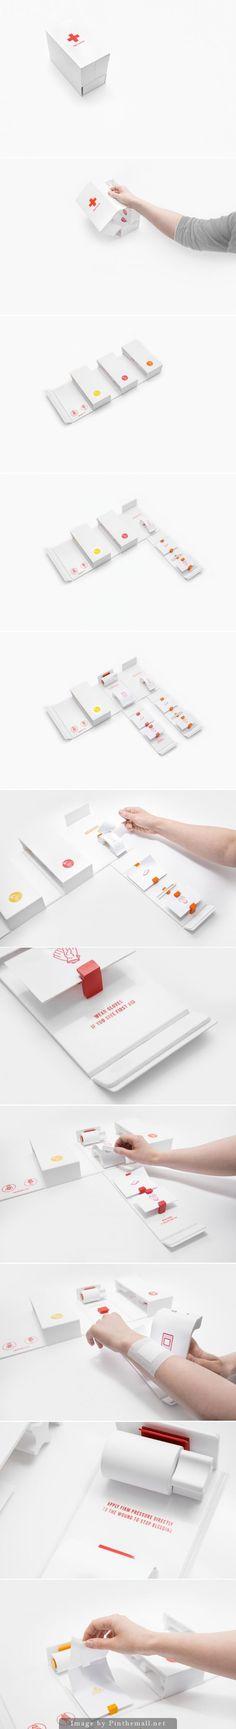 FIRST AID KIT BY GABRIELE MELDAIKYTE | packaging | Pinterest / Smart / Minimal / Organized / Useful